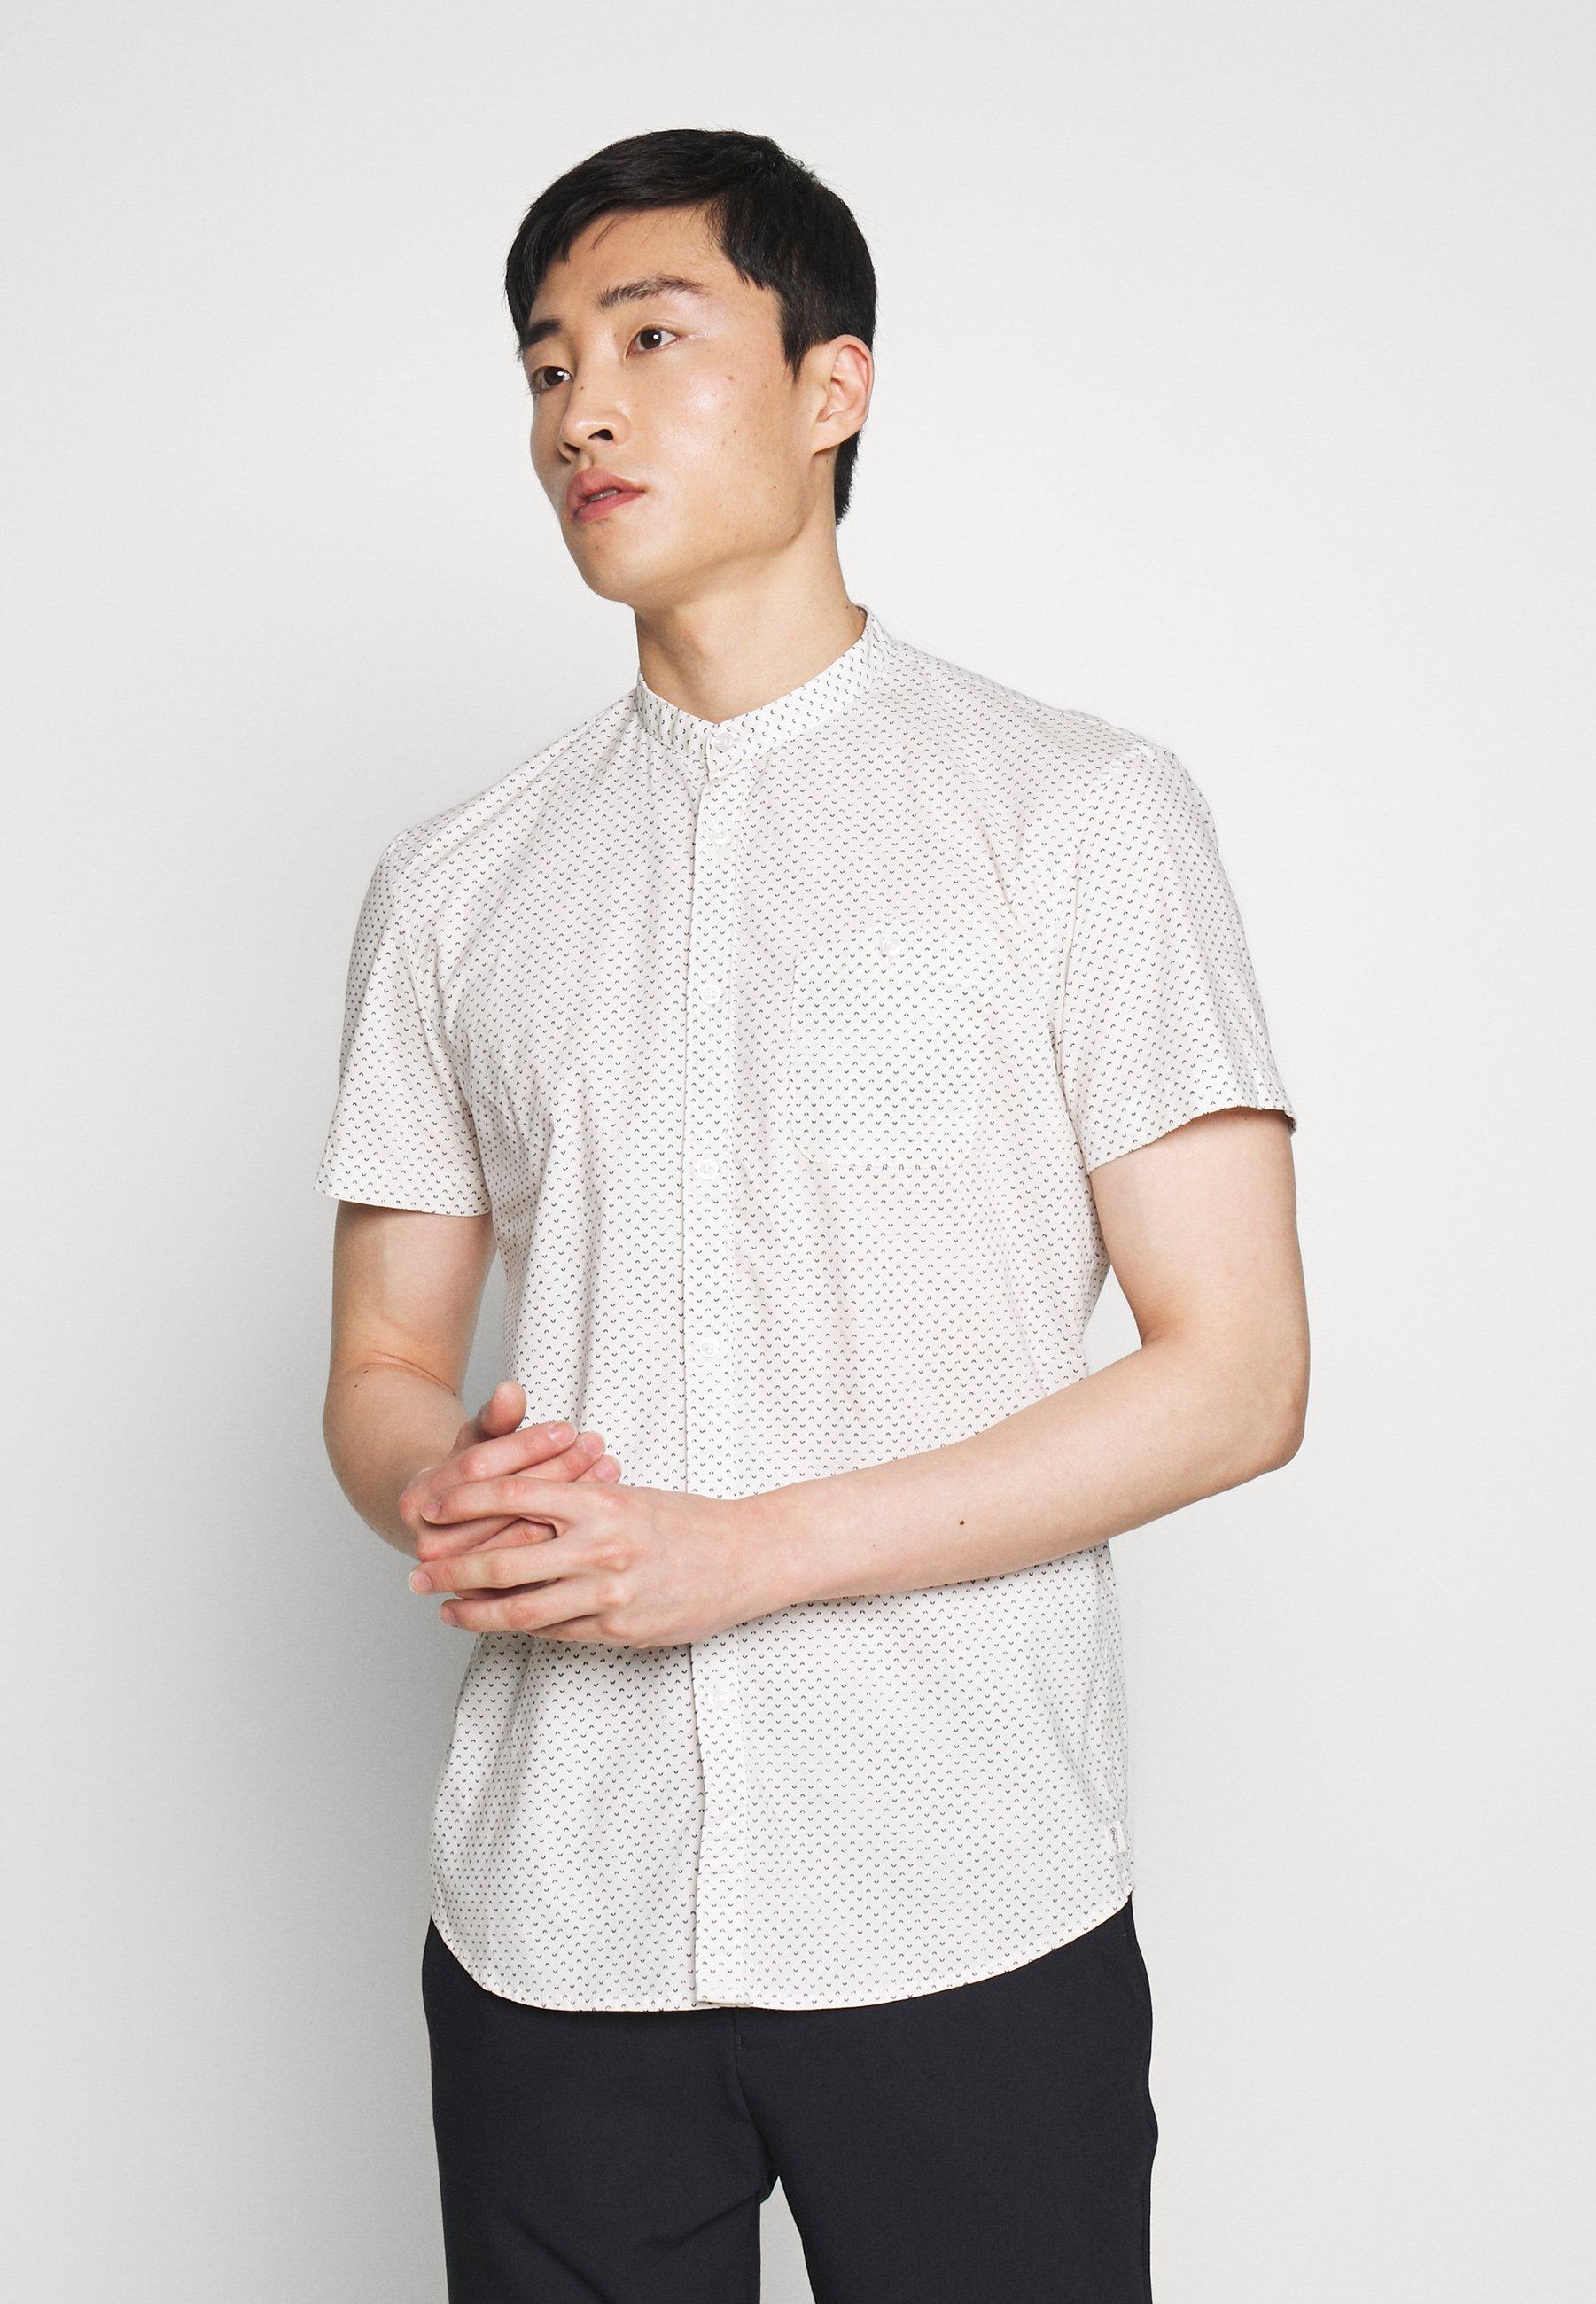 TOM TAILOR DENIM STAND UP COLLAR SHIRT - Koszula - light cream corn print/white